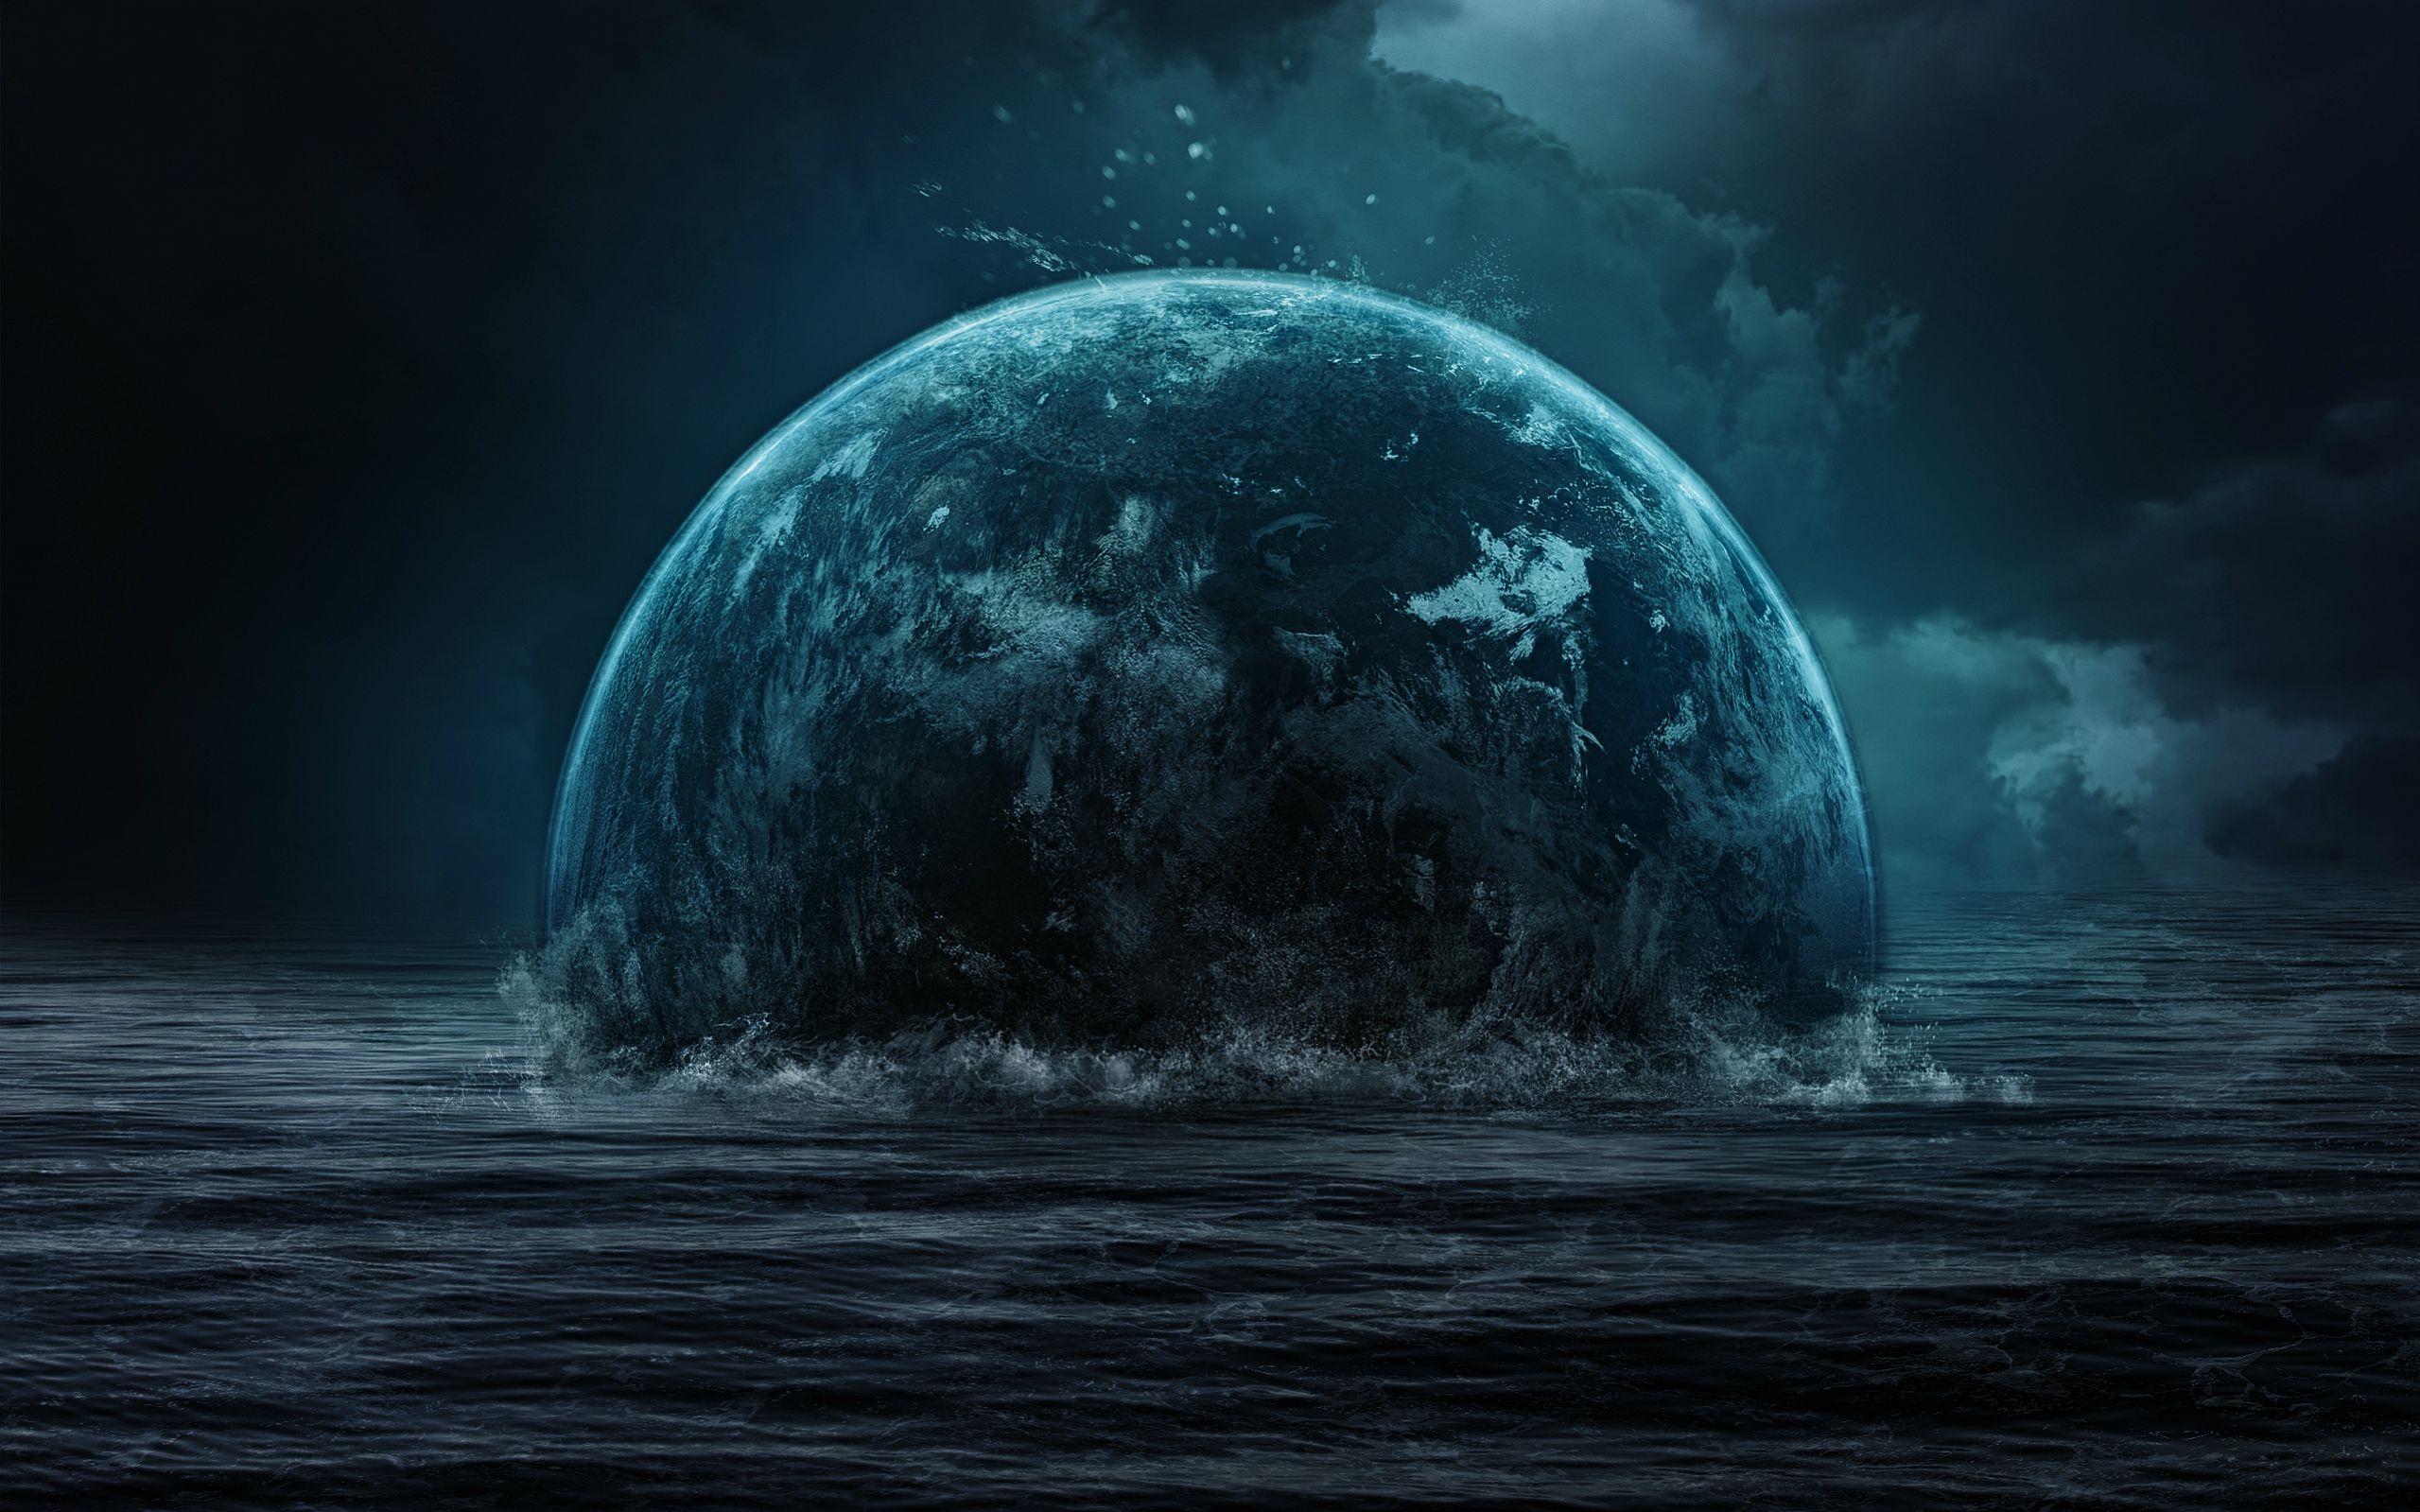 Fantasy Planet Rise Sea Clouds Sky wallpaper Best HD 2559x1599